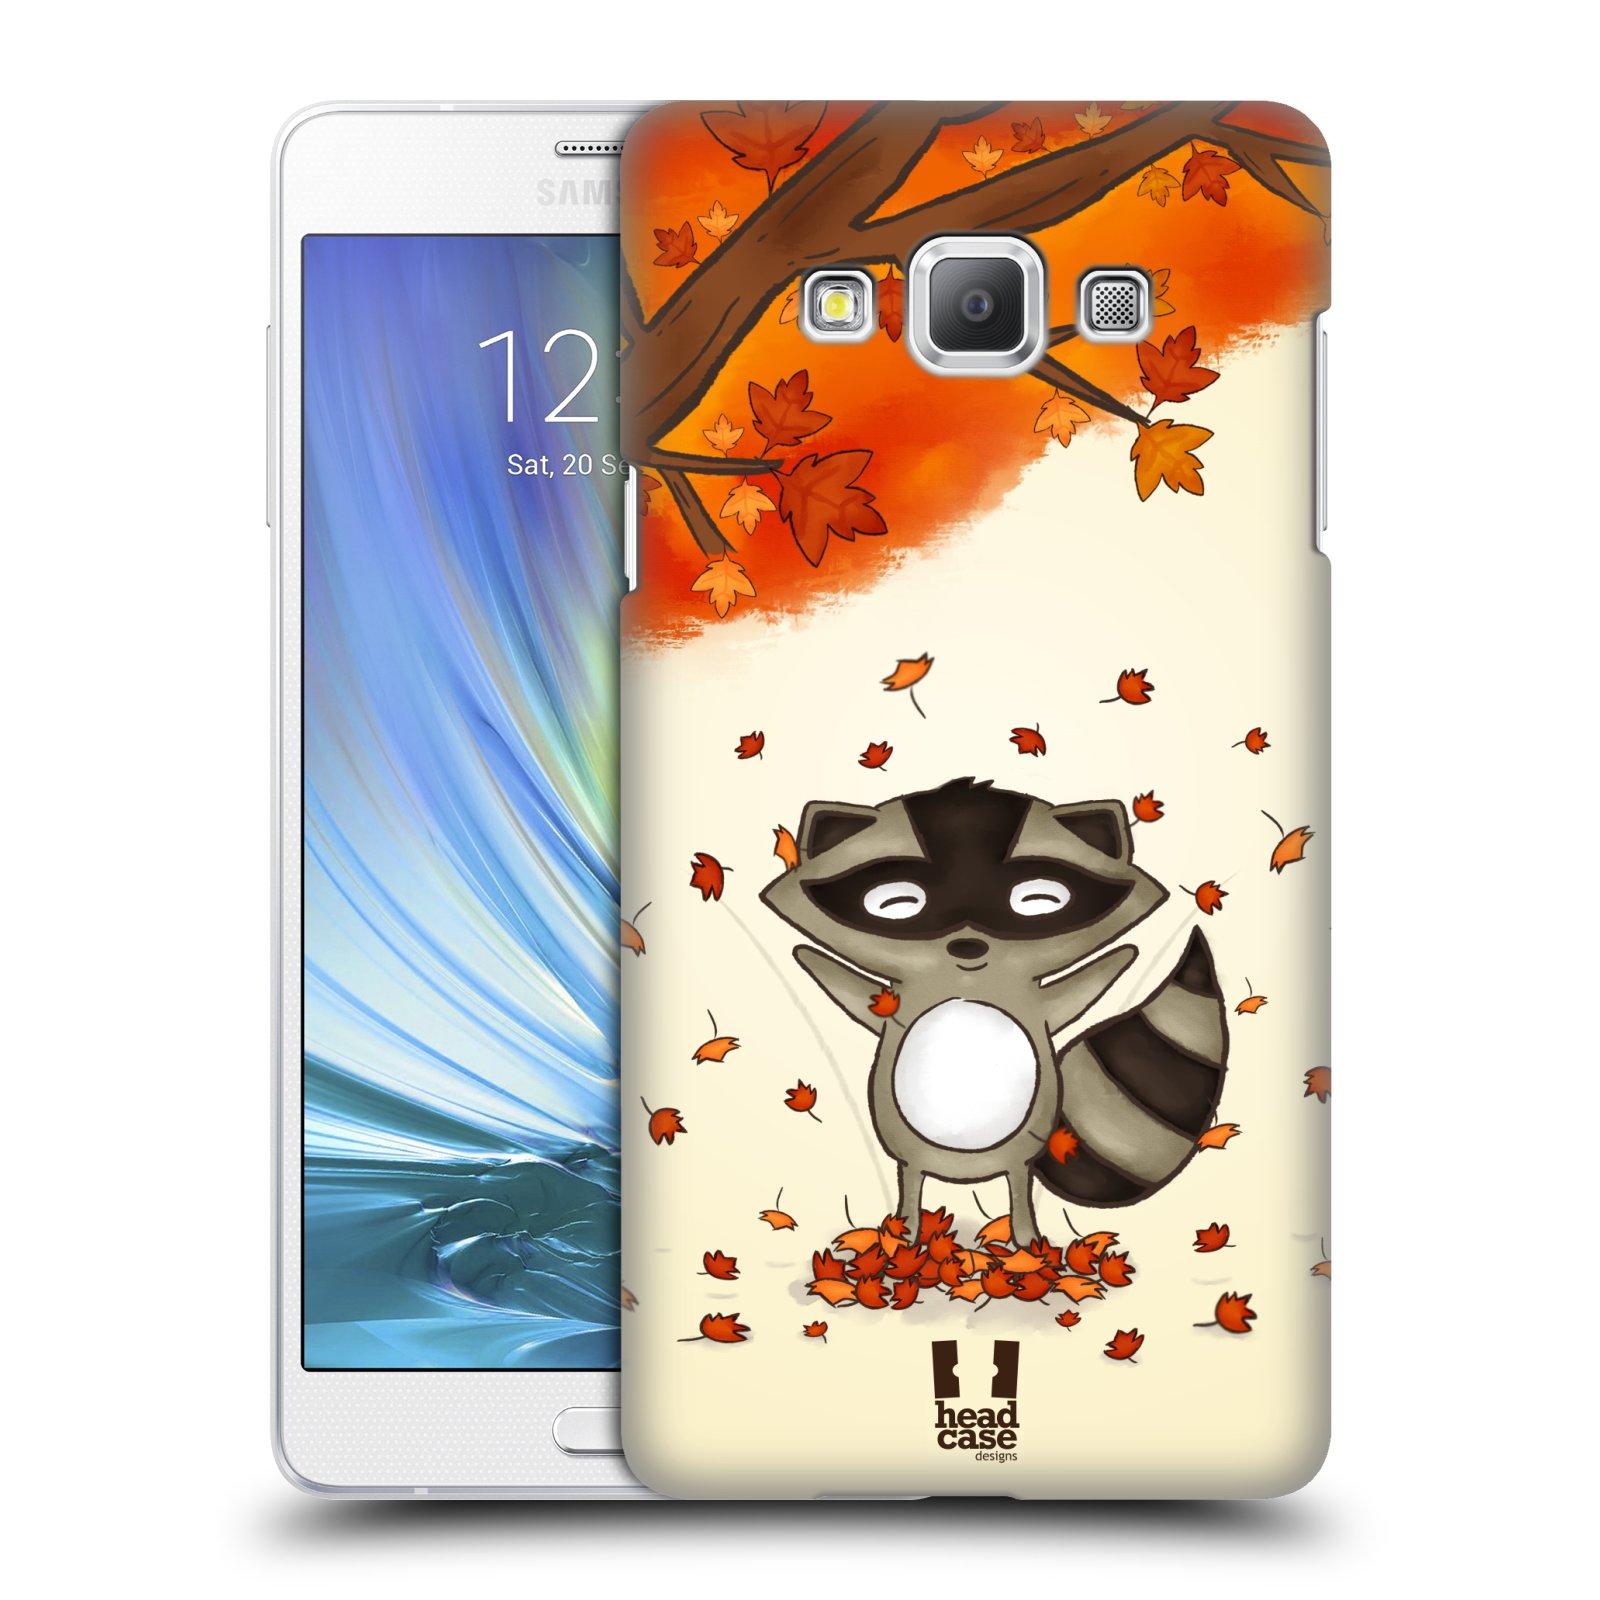 HEAD CASE plastový obal na mobil SAMSUNG GALAXY A7 vzor podzimní zvířátka mýval